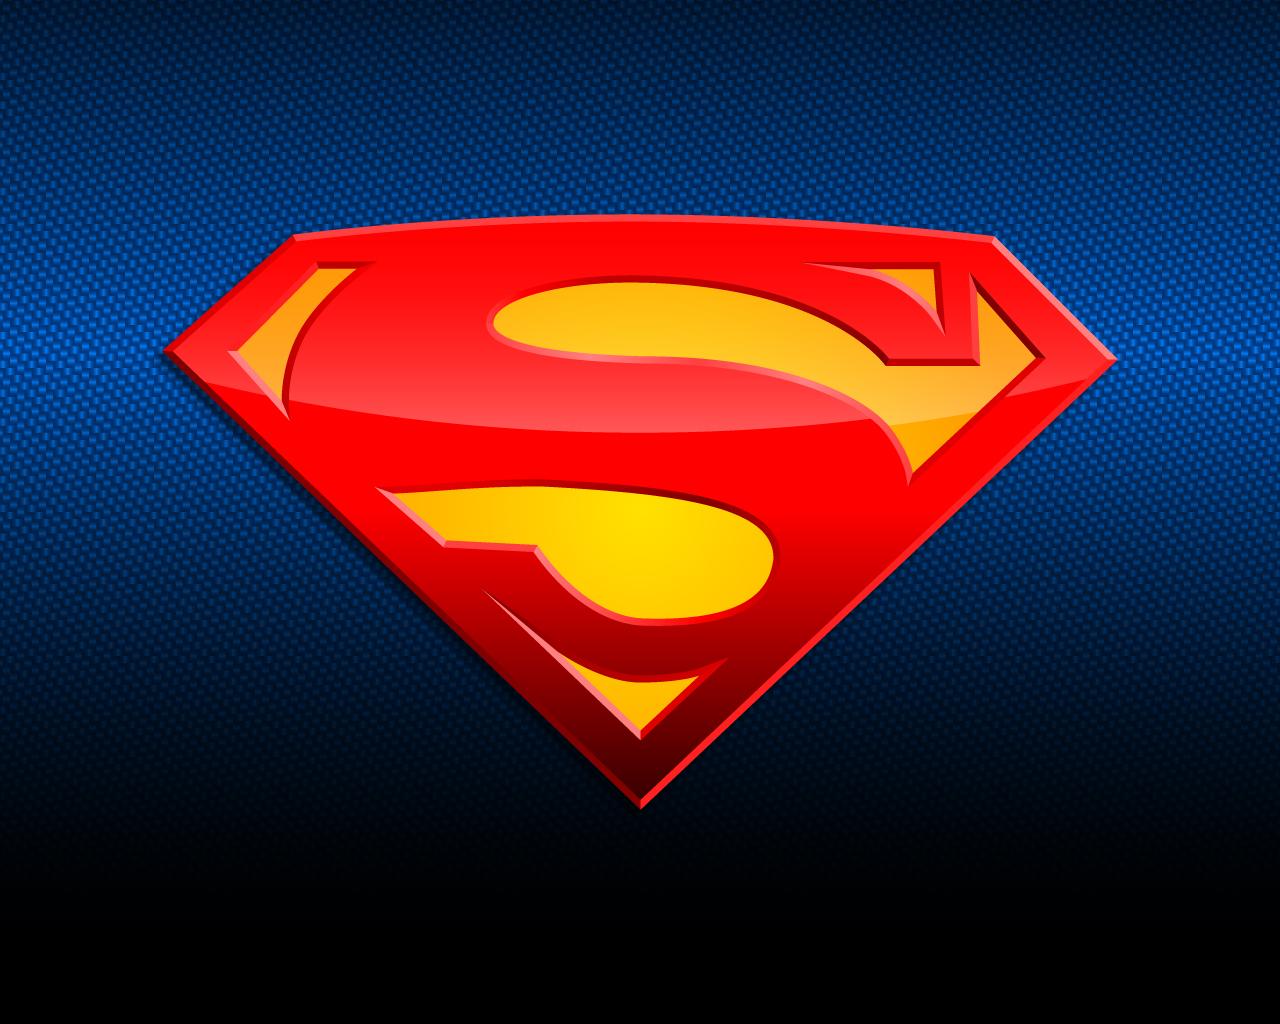 Superman Wallpaper 1280x1024 Superman 1280x1024